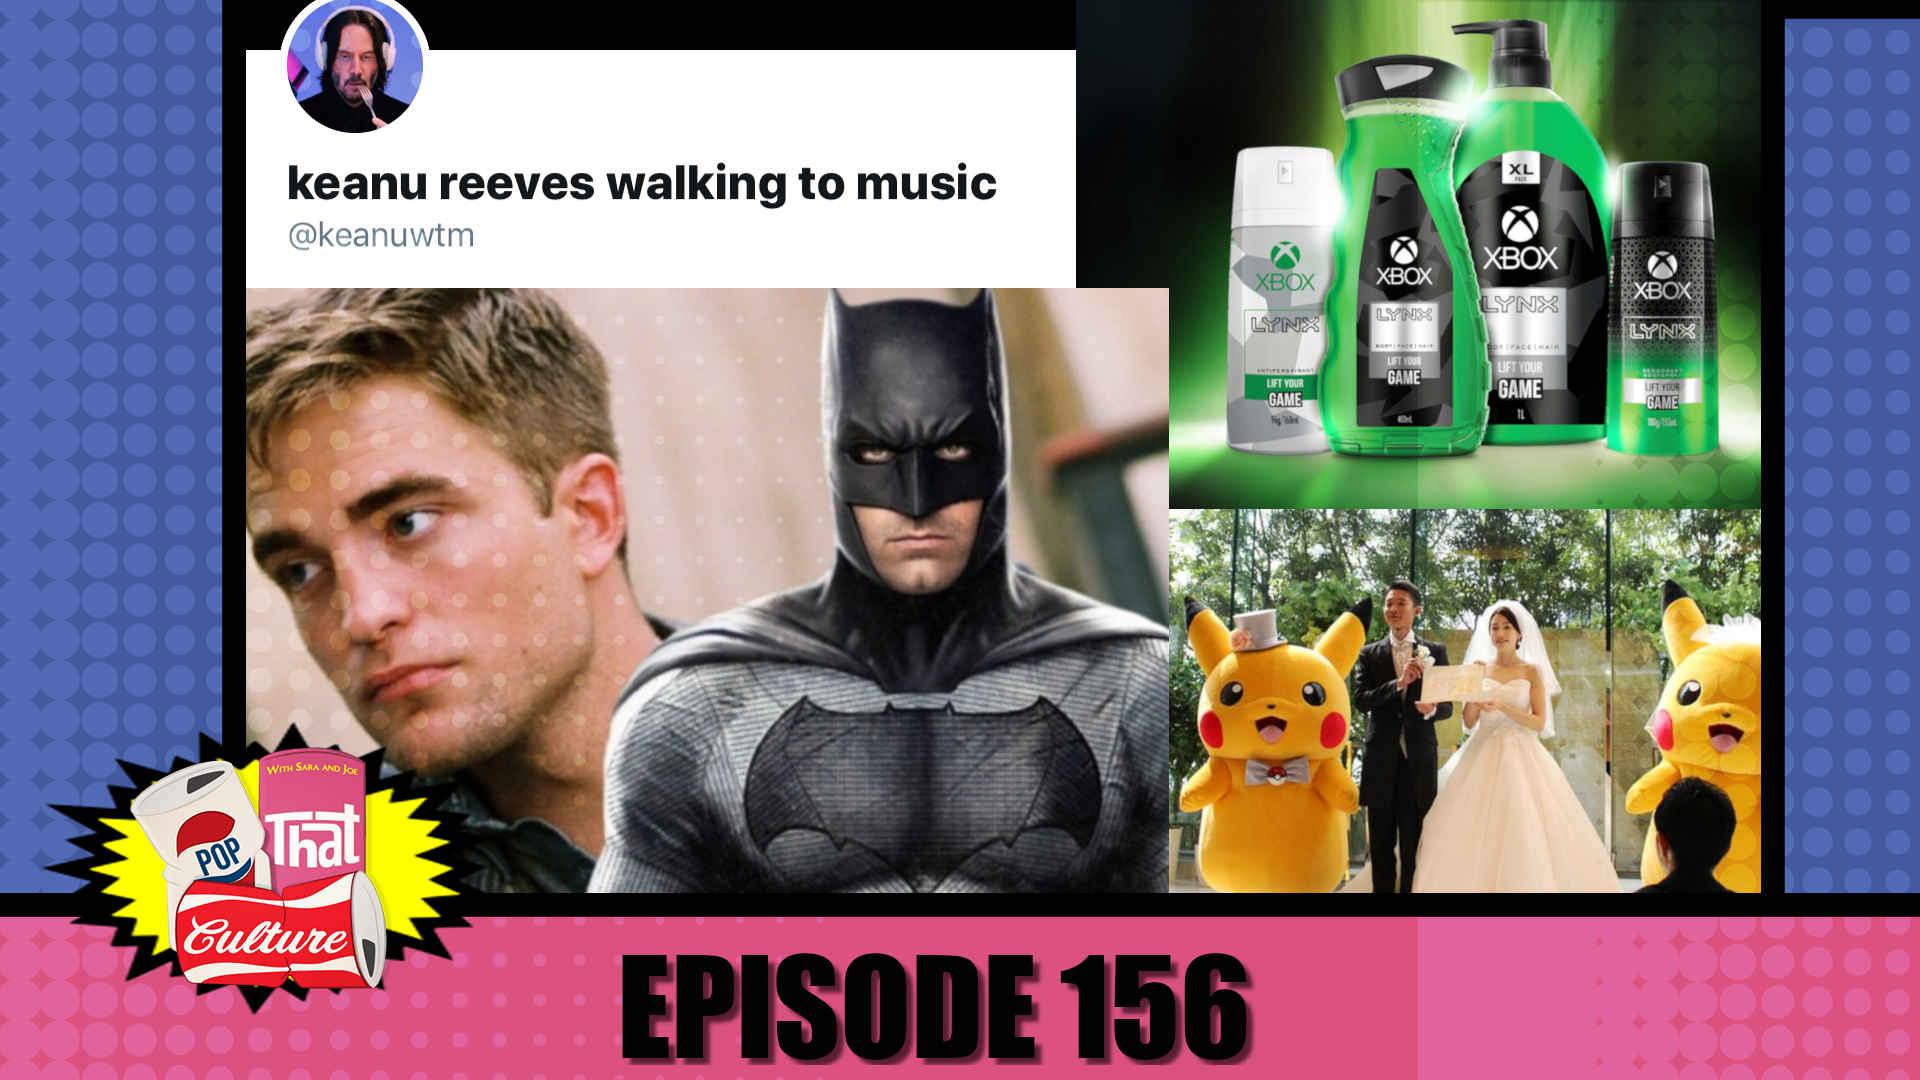 Pop That Culture - Episode 156